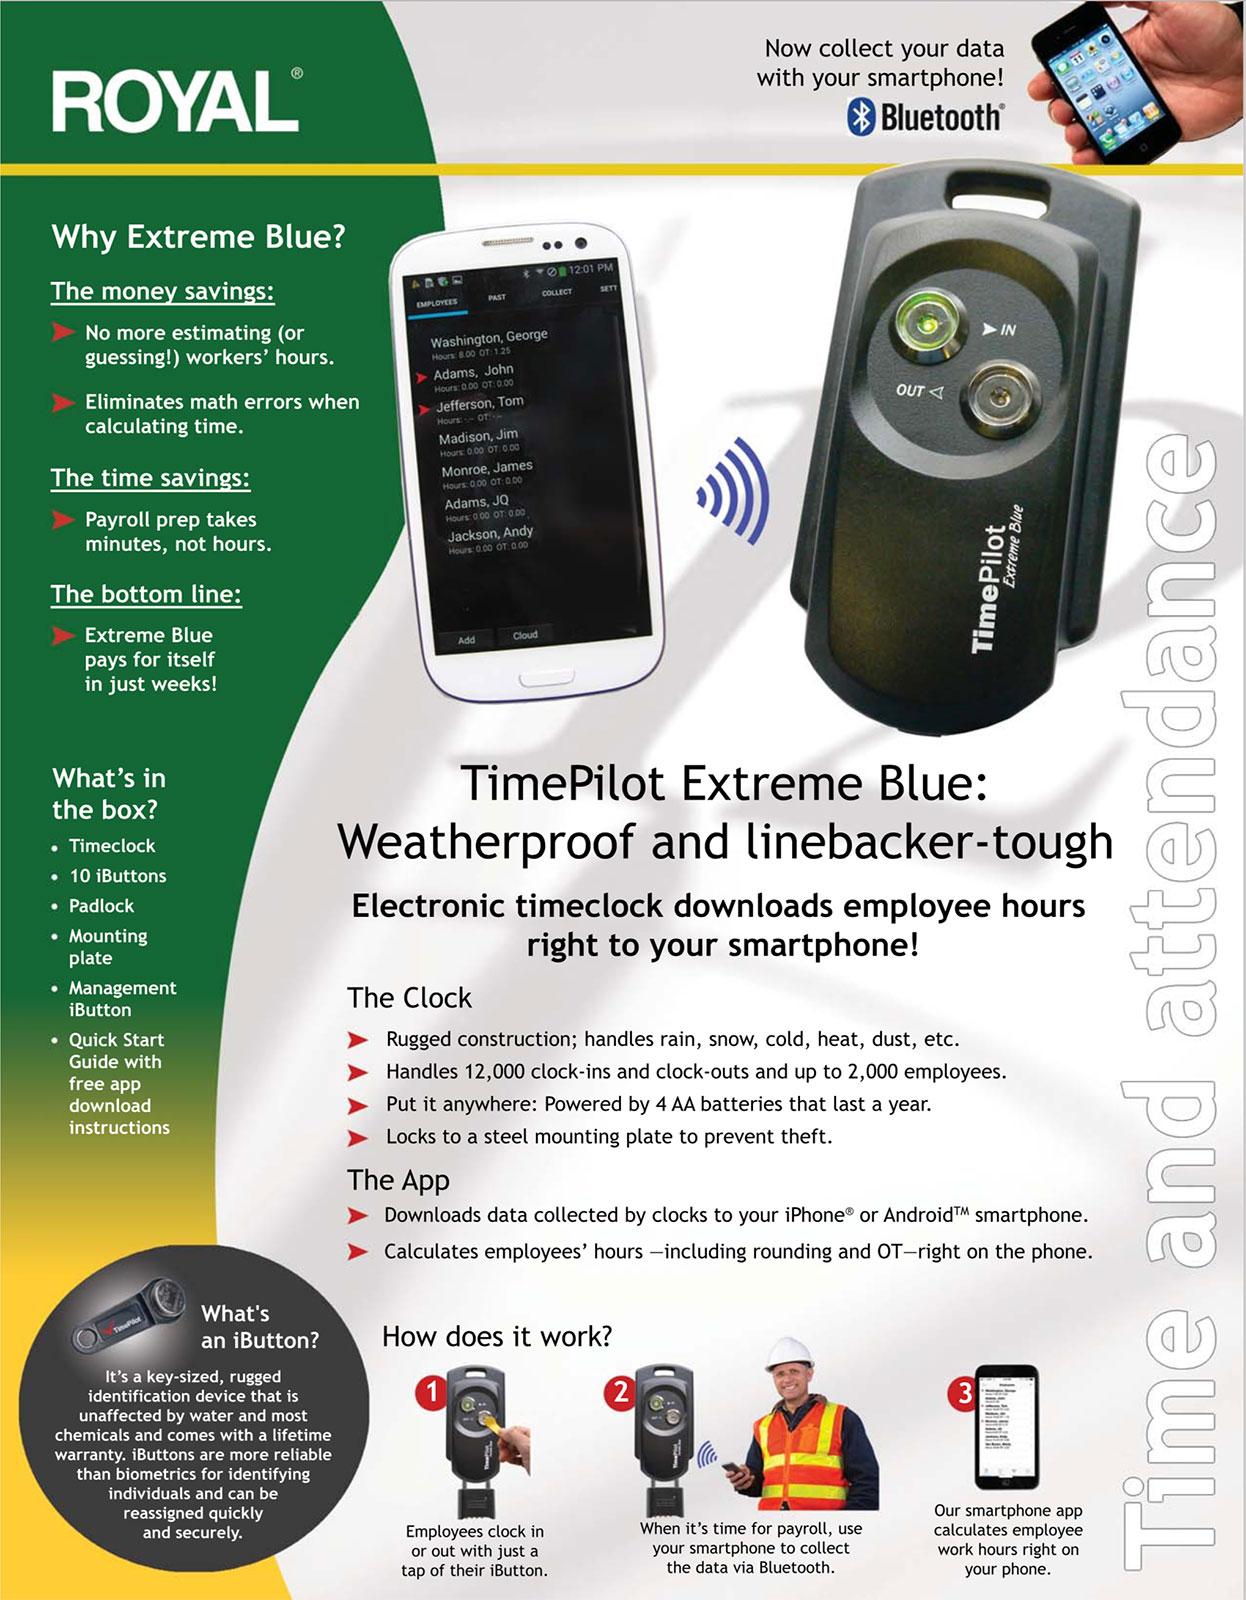 TimePilotExtremeBlue